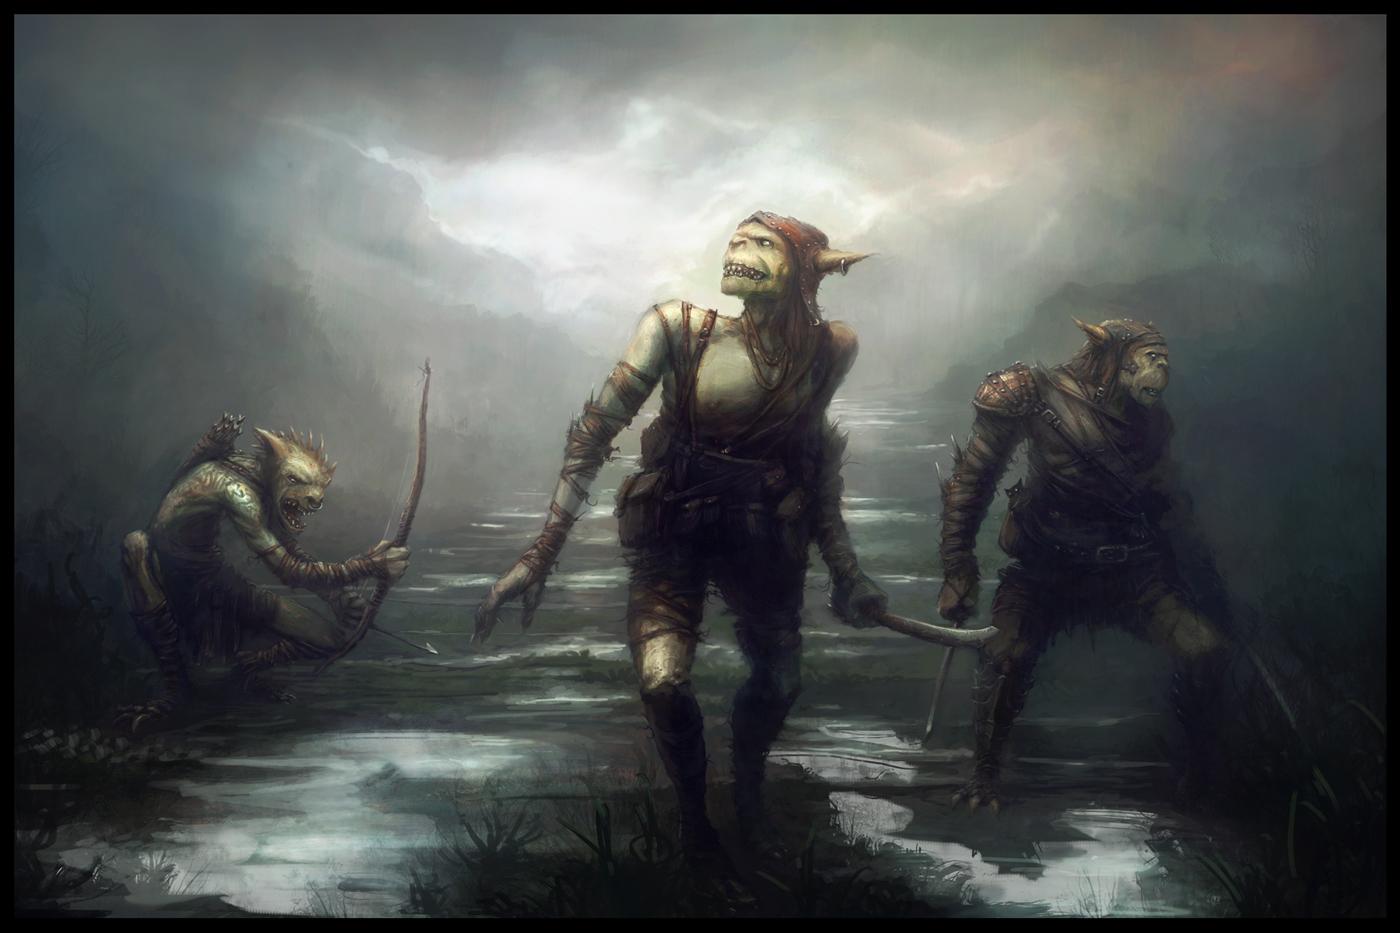 1400x933 2558 goblin rogues 2d fantasy goblins picture image digital art